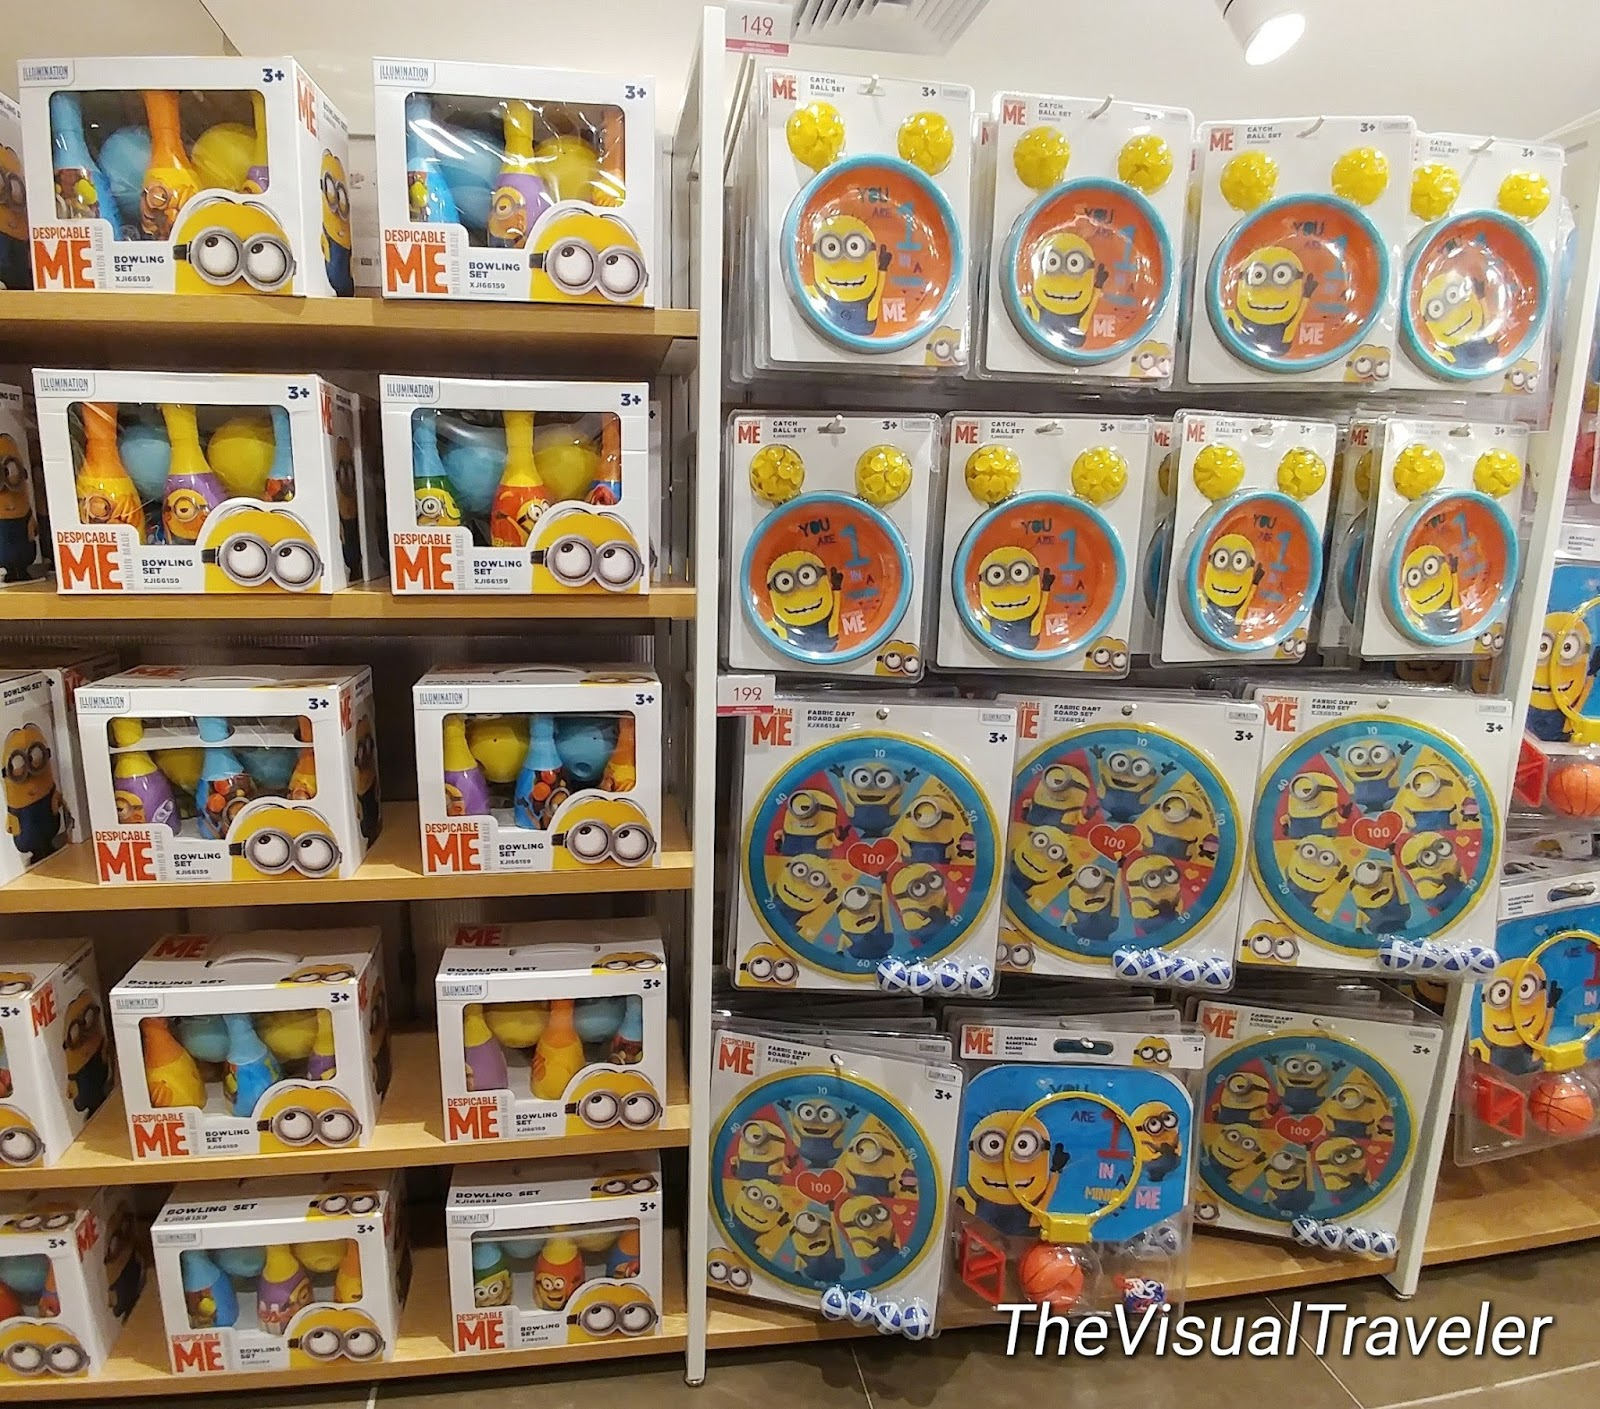 MINISO Japanese Lifestyle Store opens in SM City Cebu